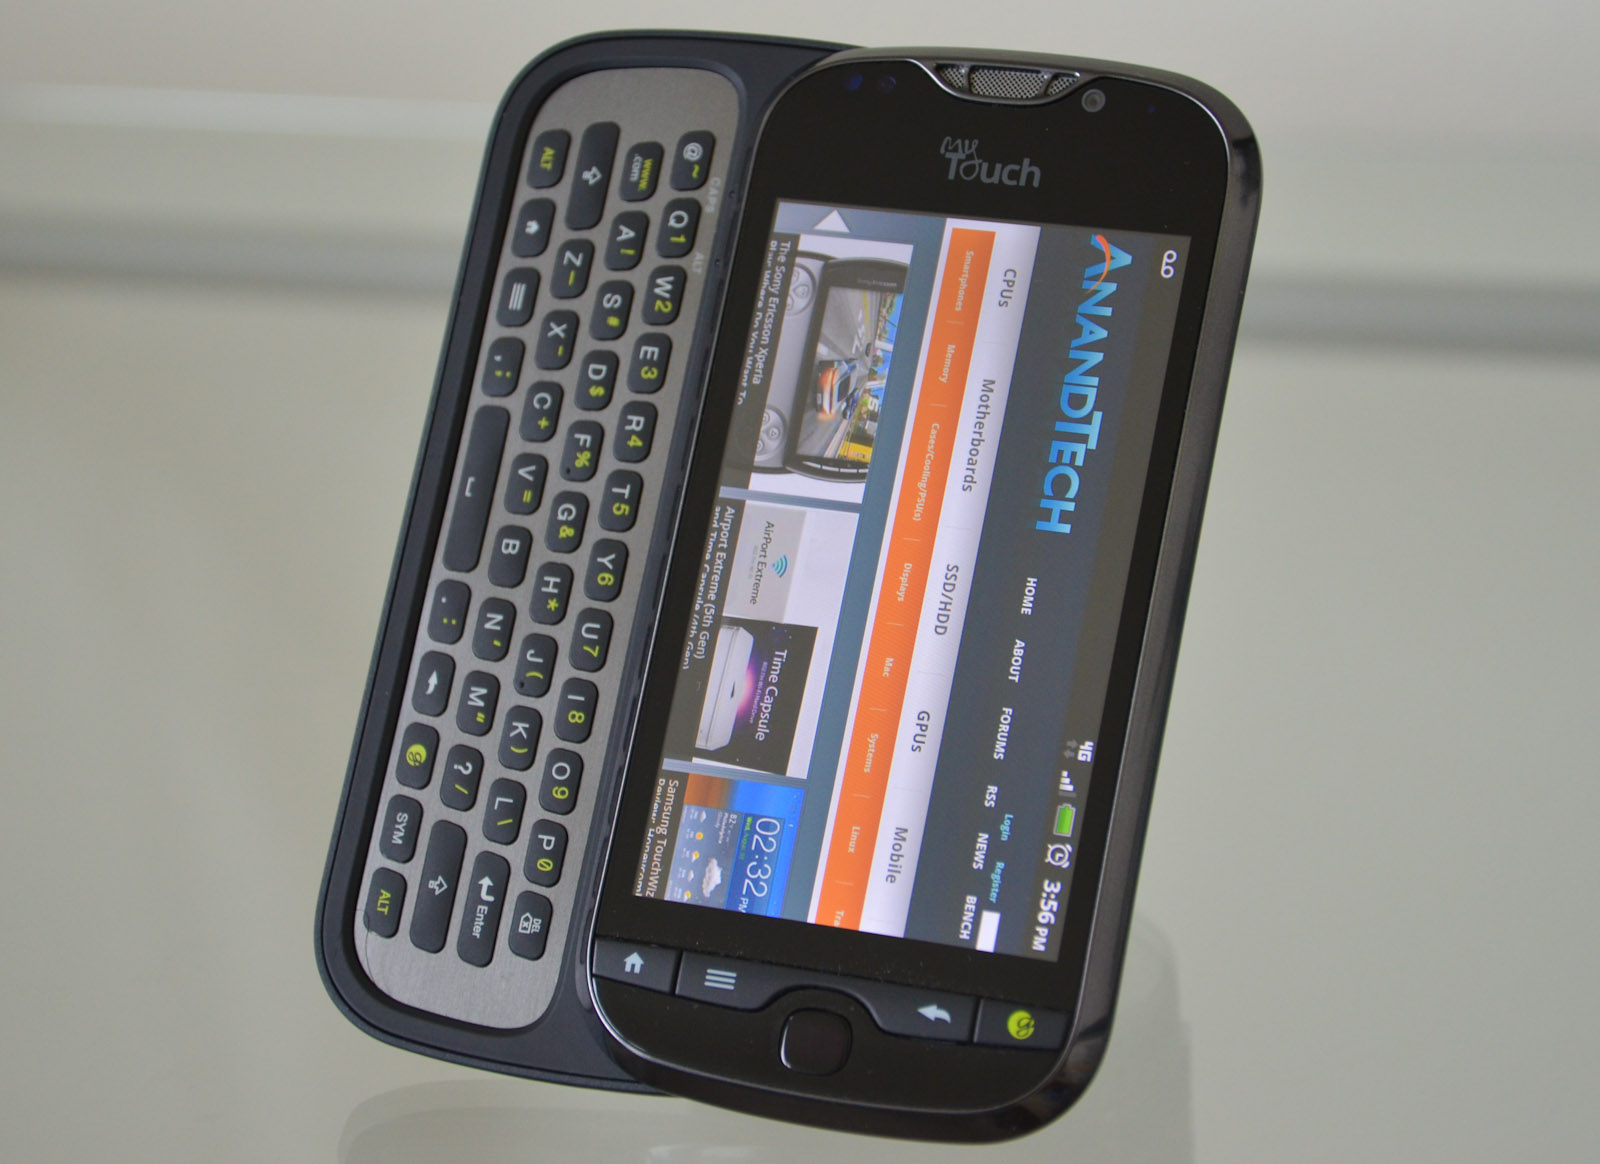 htc mytouch 4g user manual online user manual u2022 rh pandadigital co HTC myTouch 4G T-Mobile HTC myTouch 4G T-Mobile